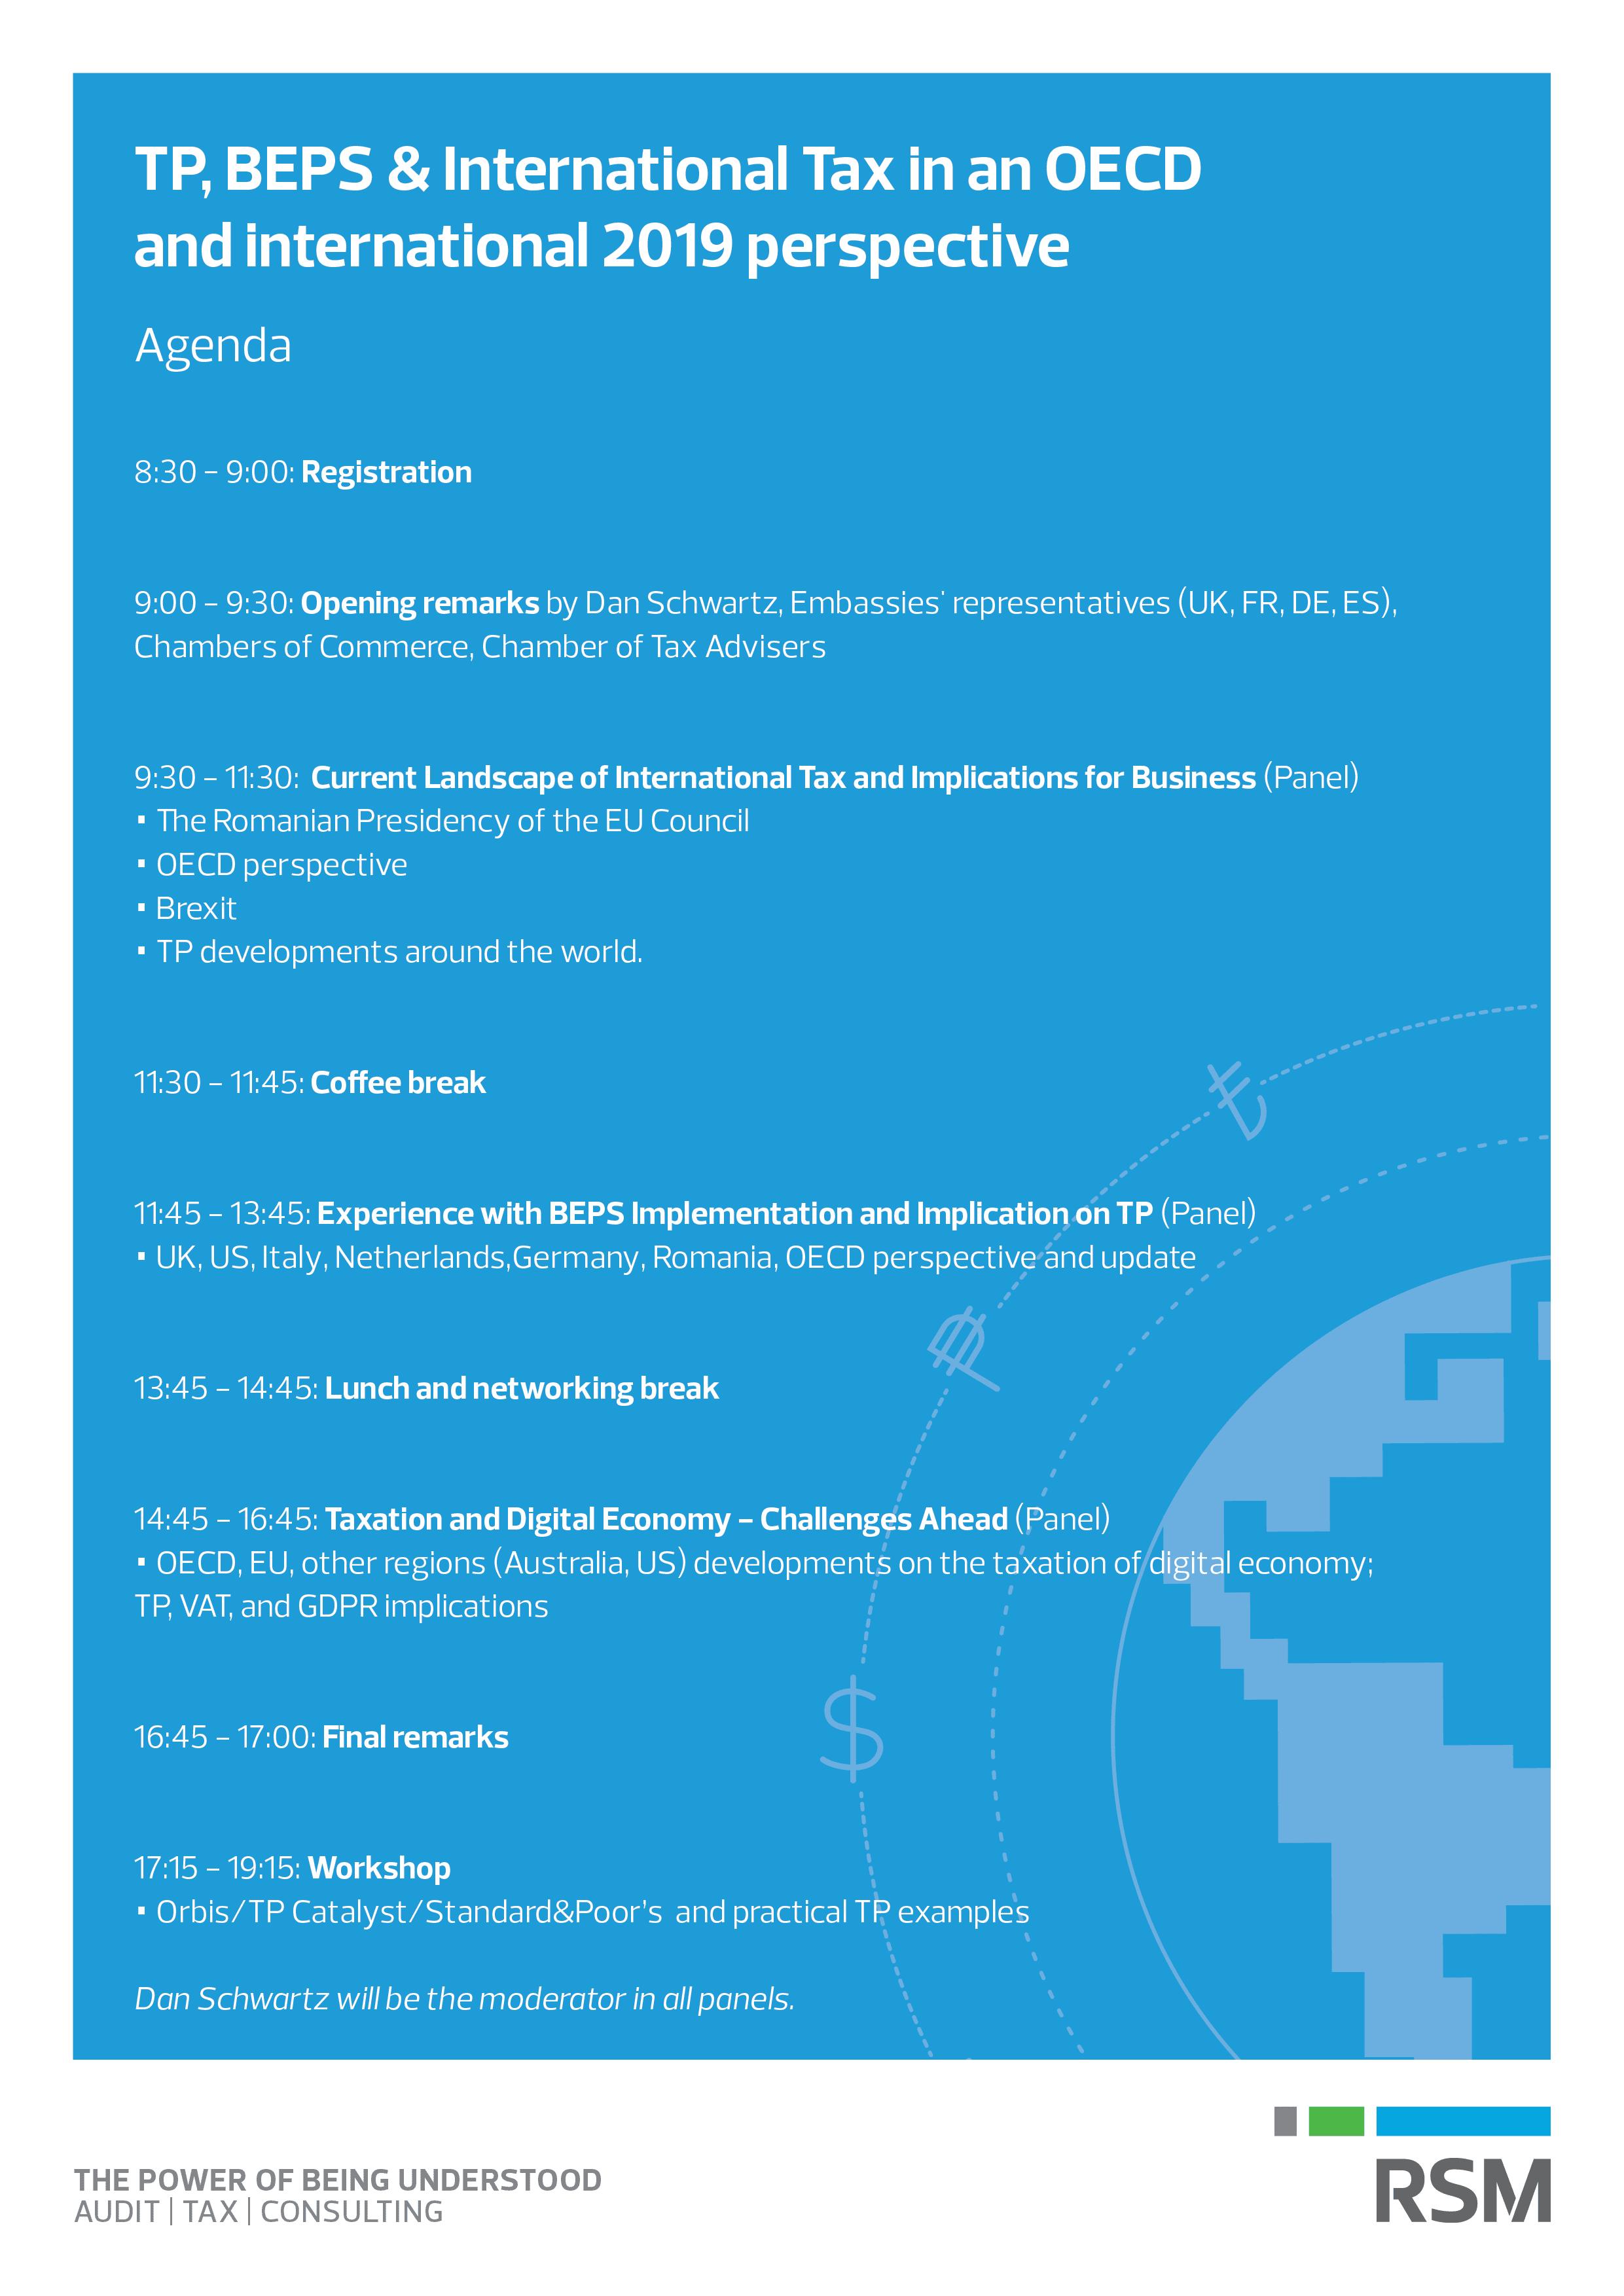 rsm_beps_2019_agenda.png